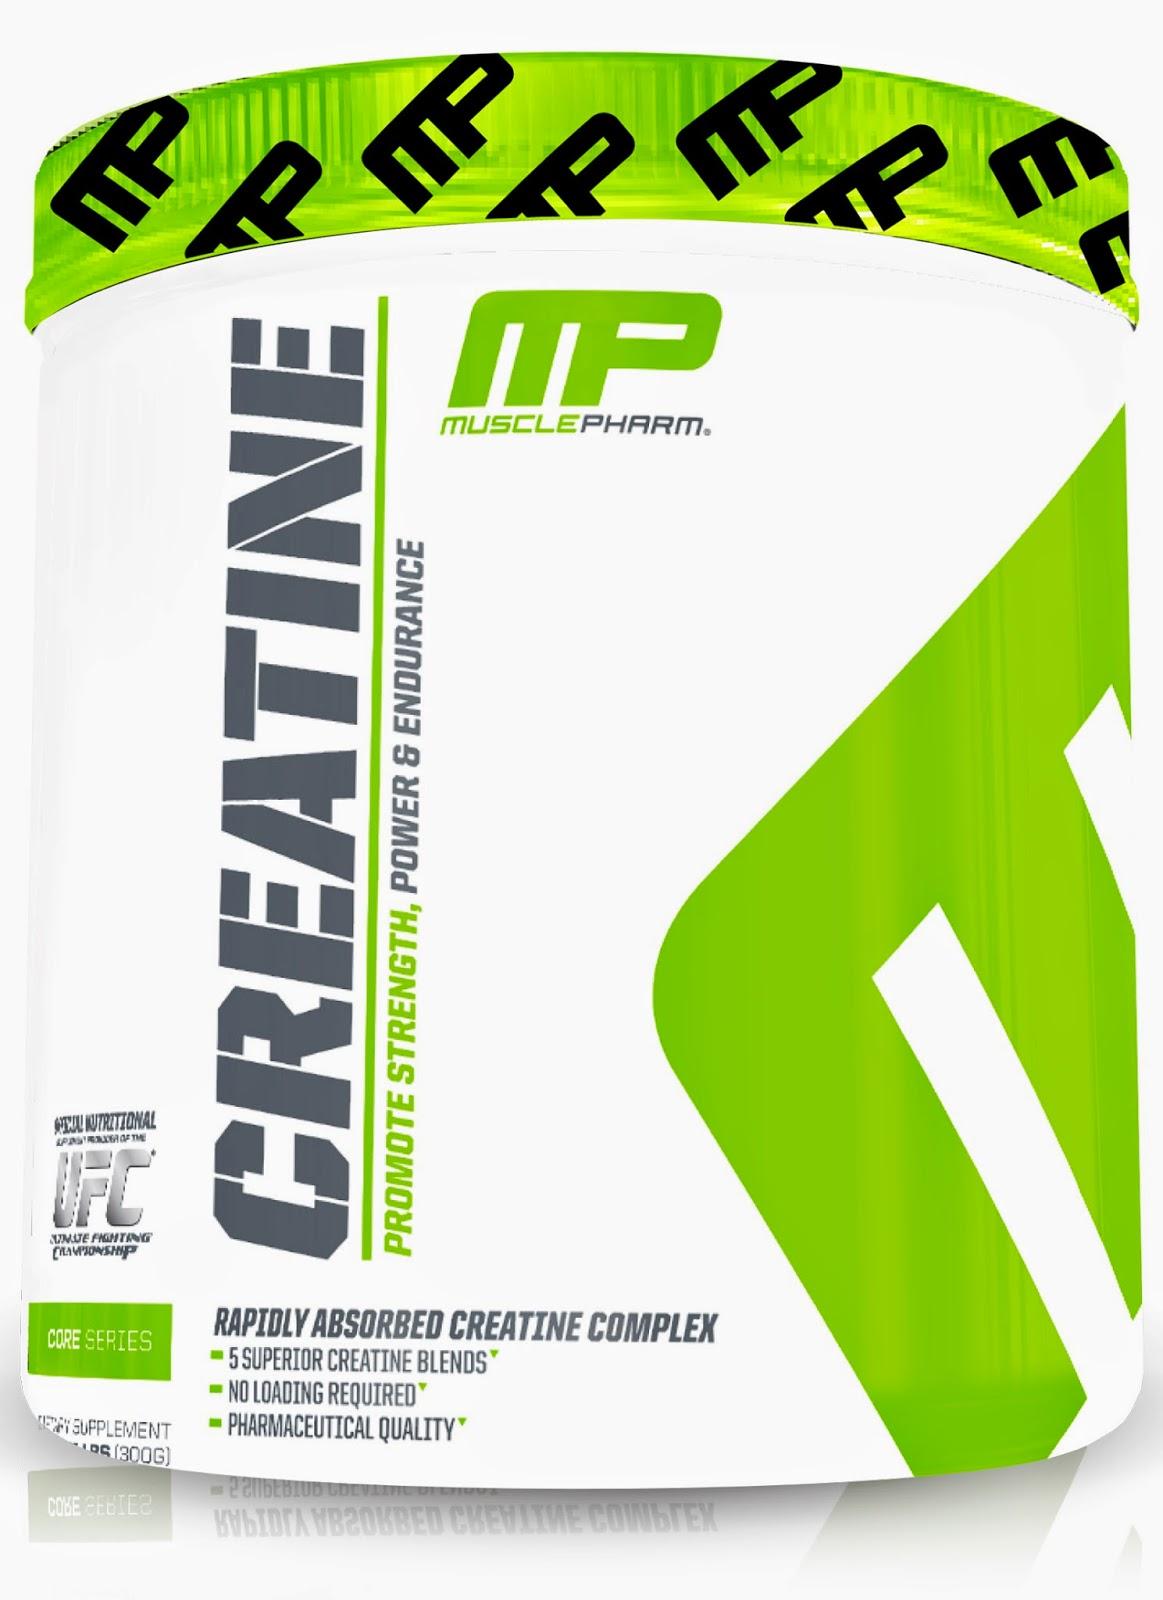 http://bodybuilding.7eer.net/c/59580/76783/2023?u=http://www.bodybuilding.com/store/musclepharm/creatine.html%20